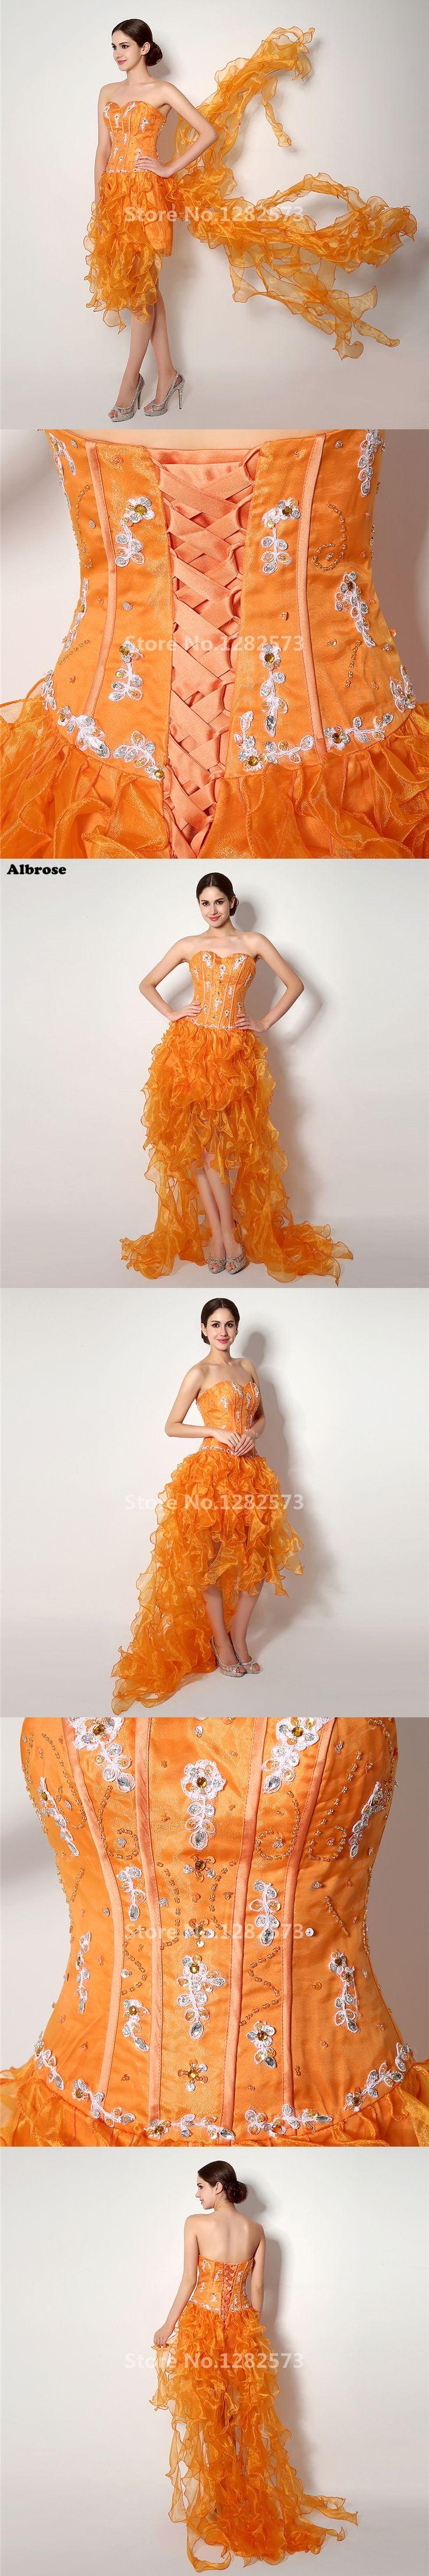 Elegant Organge High Low Evening Dress Organza Ruffles Evening Dresses Long Beaded Sequined Pretty Formal Dress Chic abiye